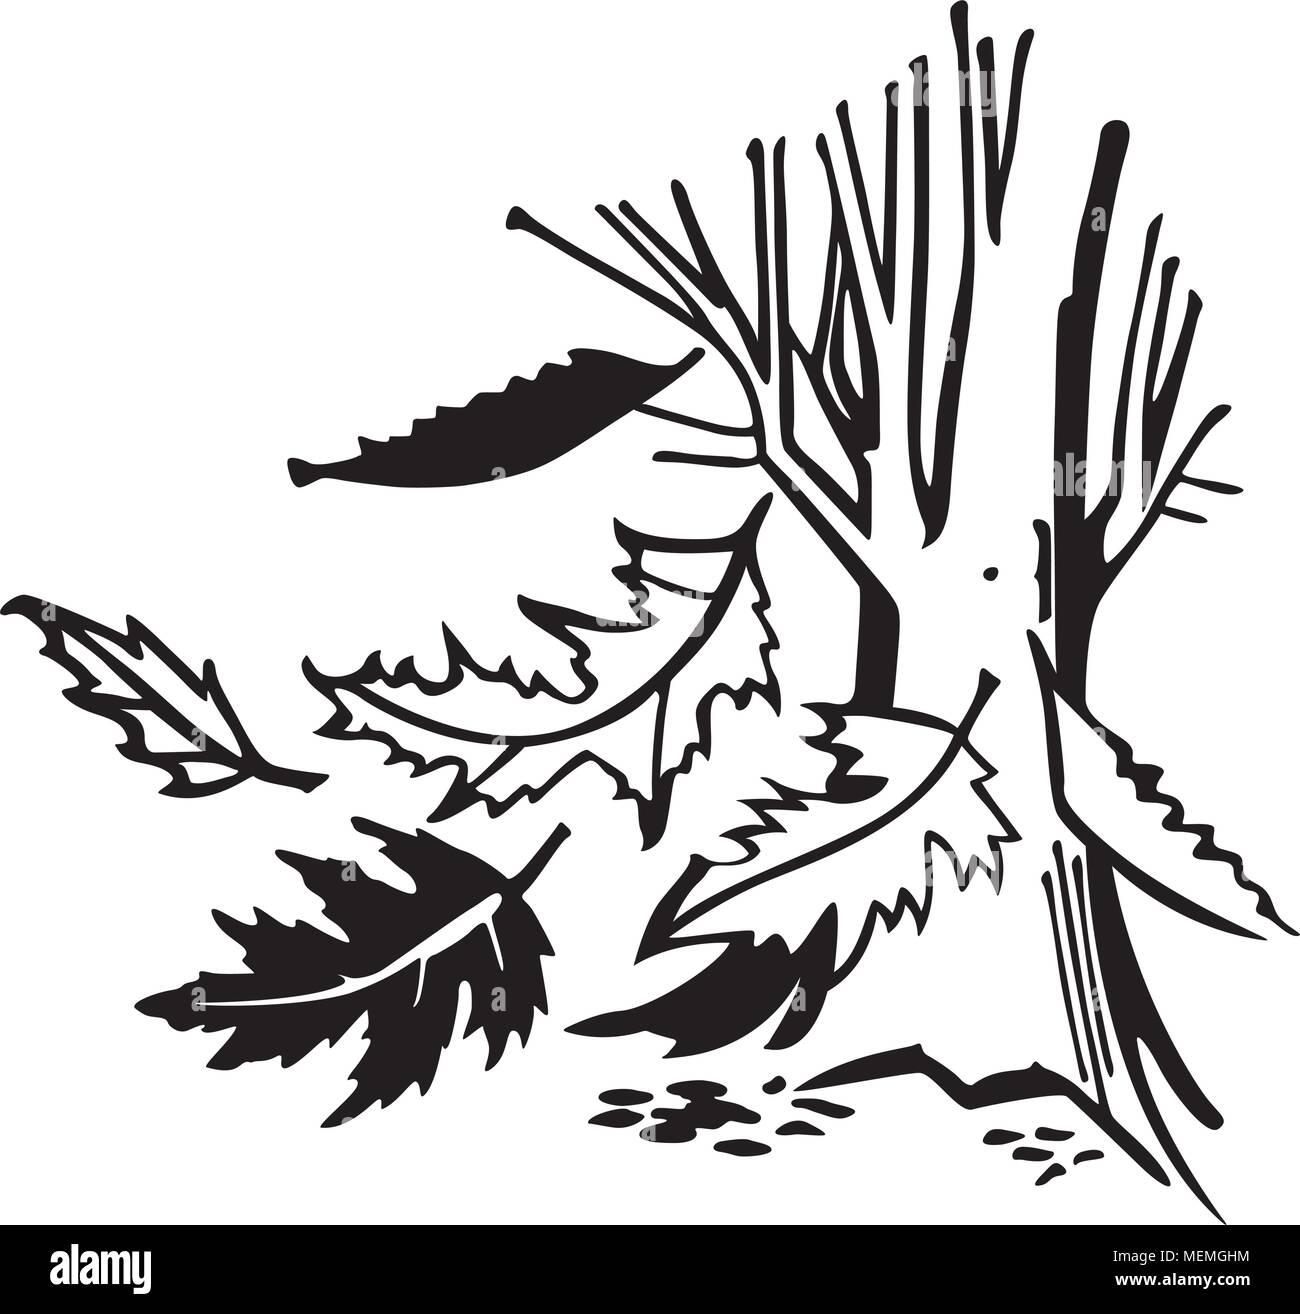 hight resolution of falling autumn leaves retro clipart illustration